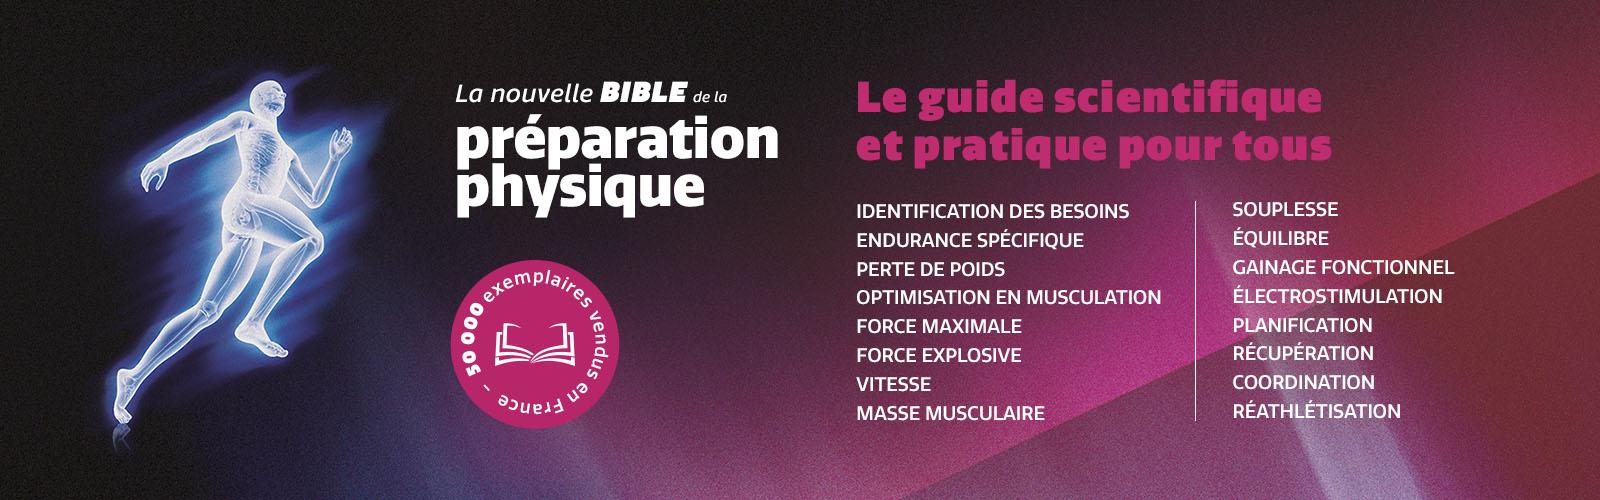 Bible_prepa_physique_slide_v2